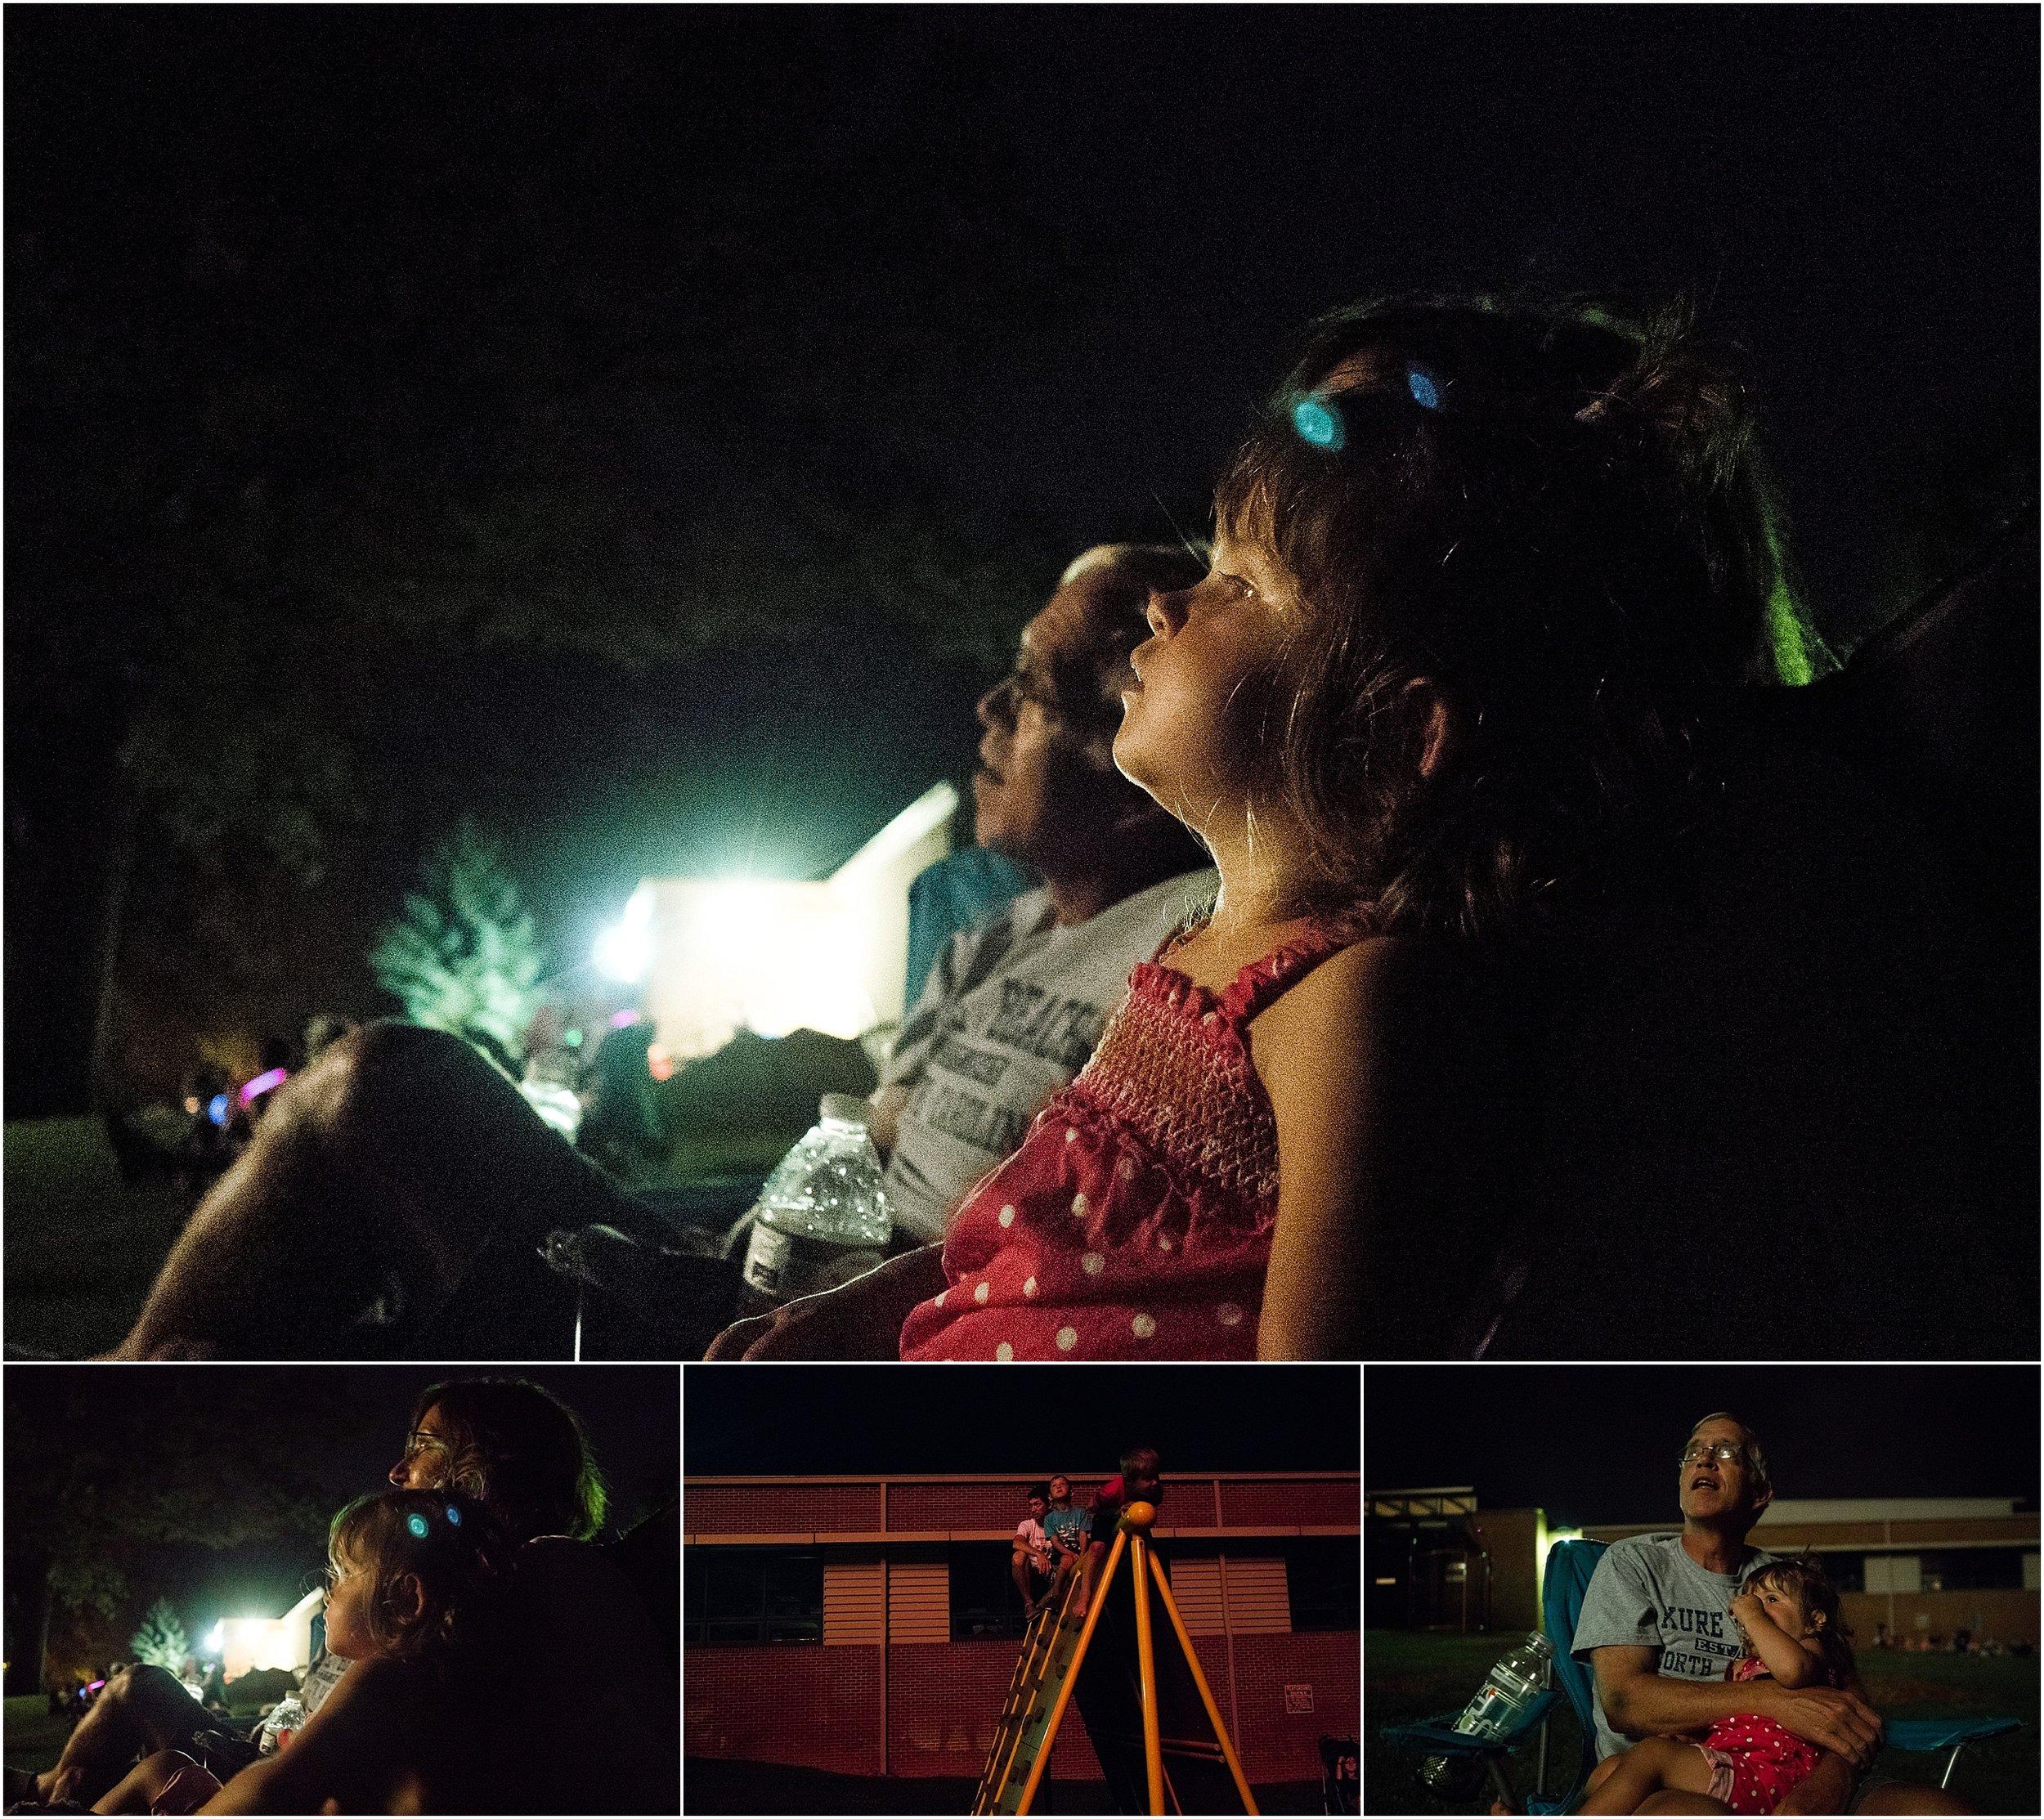 Waynesboro Virginia, fireworks show